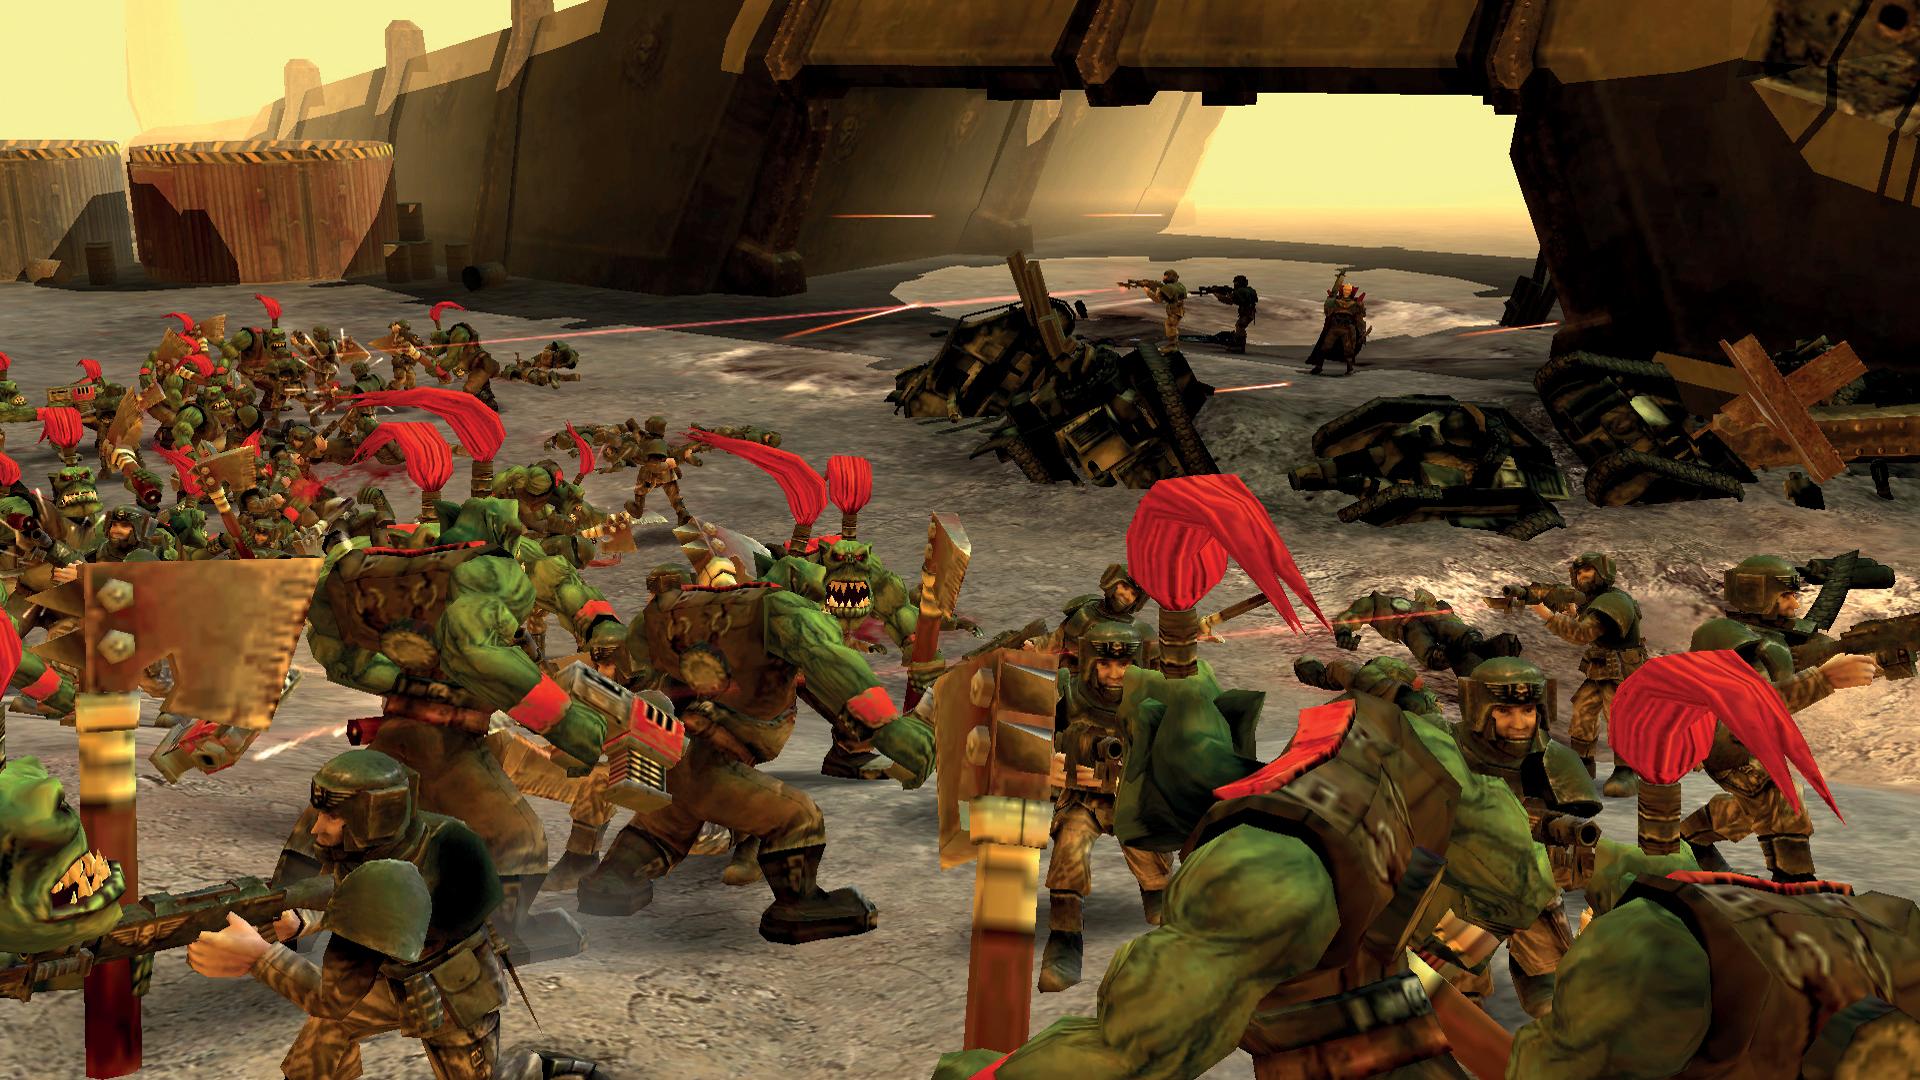 Warhammer 40,000: Dawn of War deserves a remaster